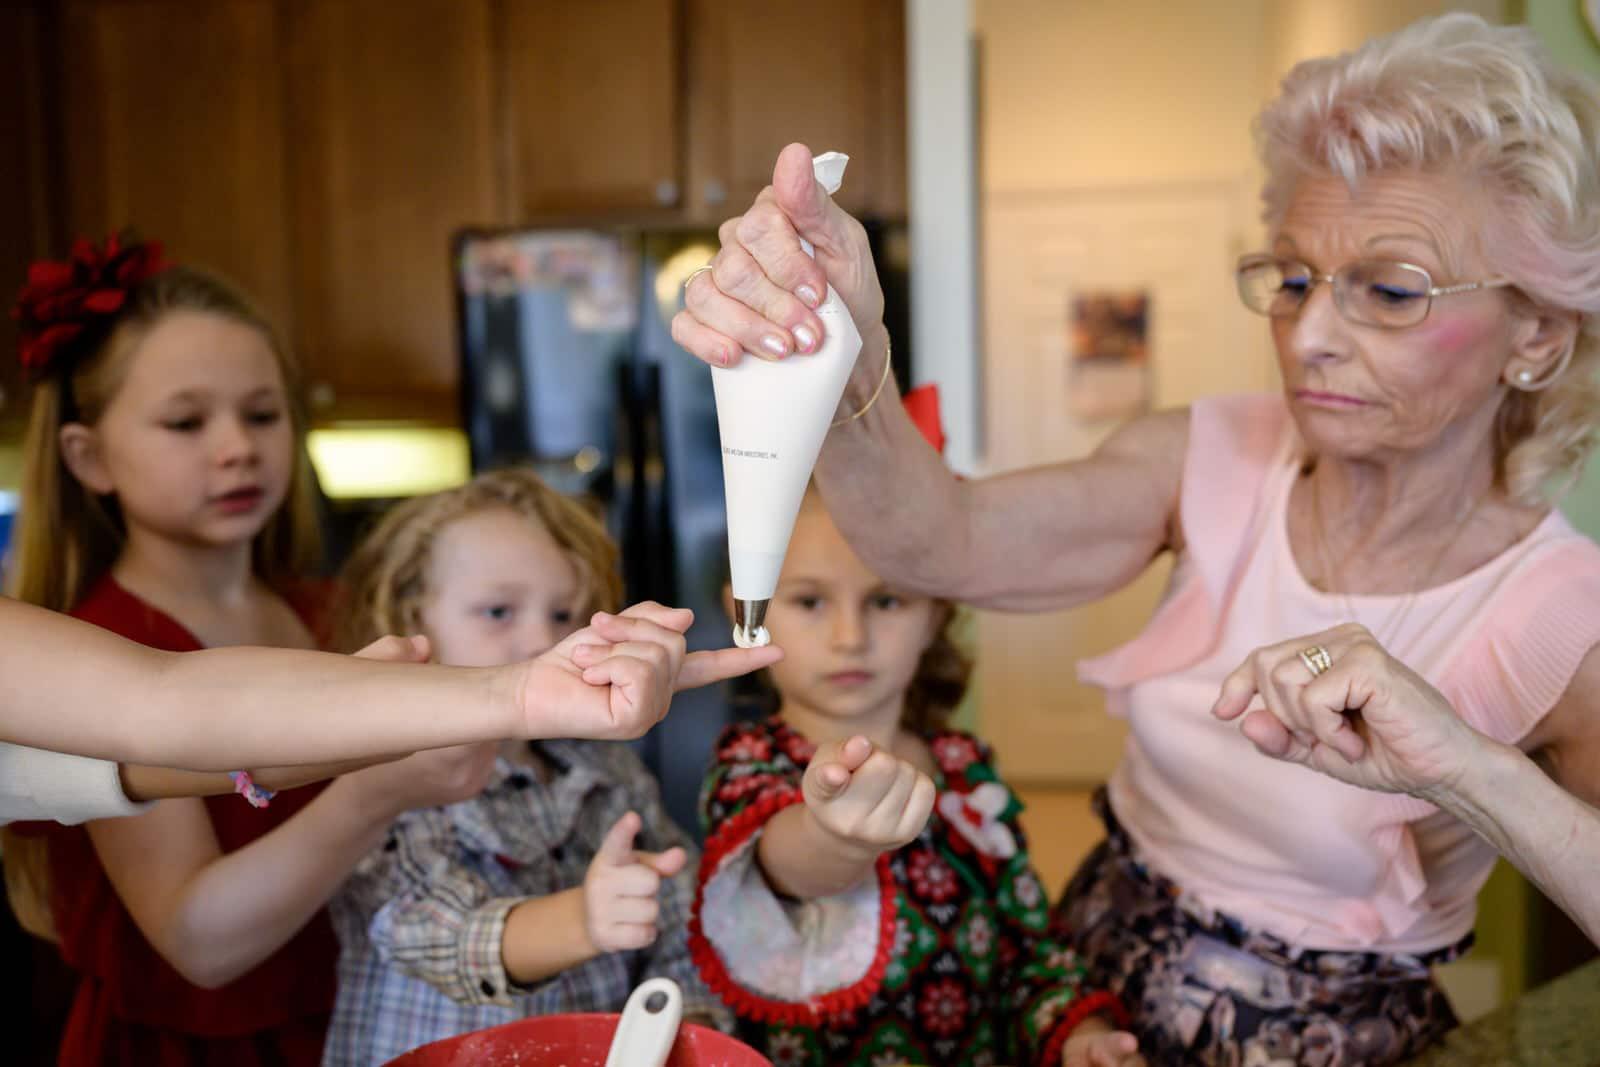 grandma allows kids to taste the frosting during cupcake baking